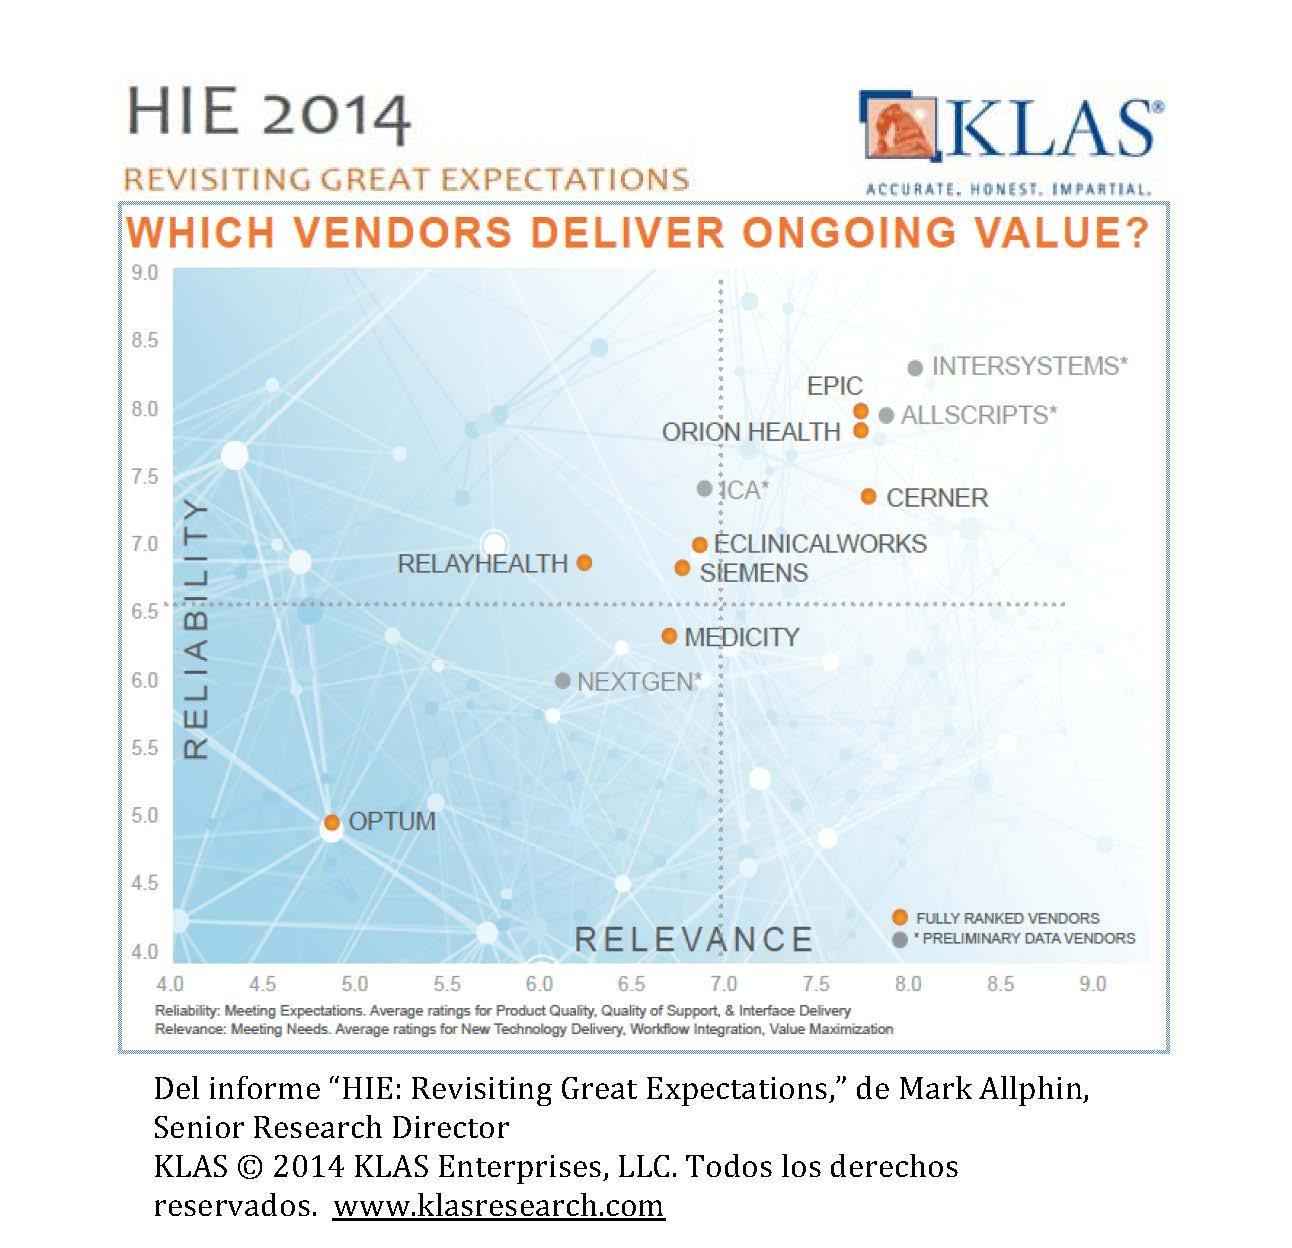 InterSystems - KLAS 2014